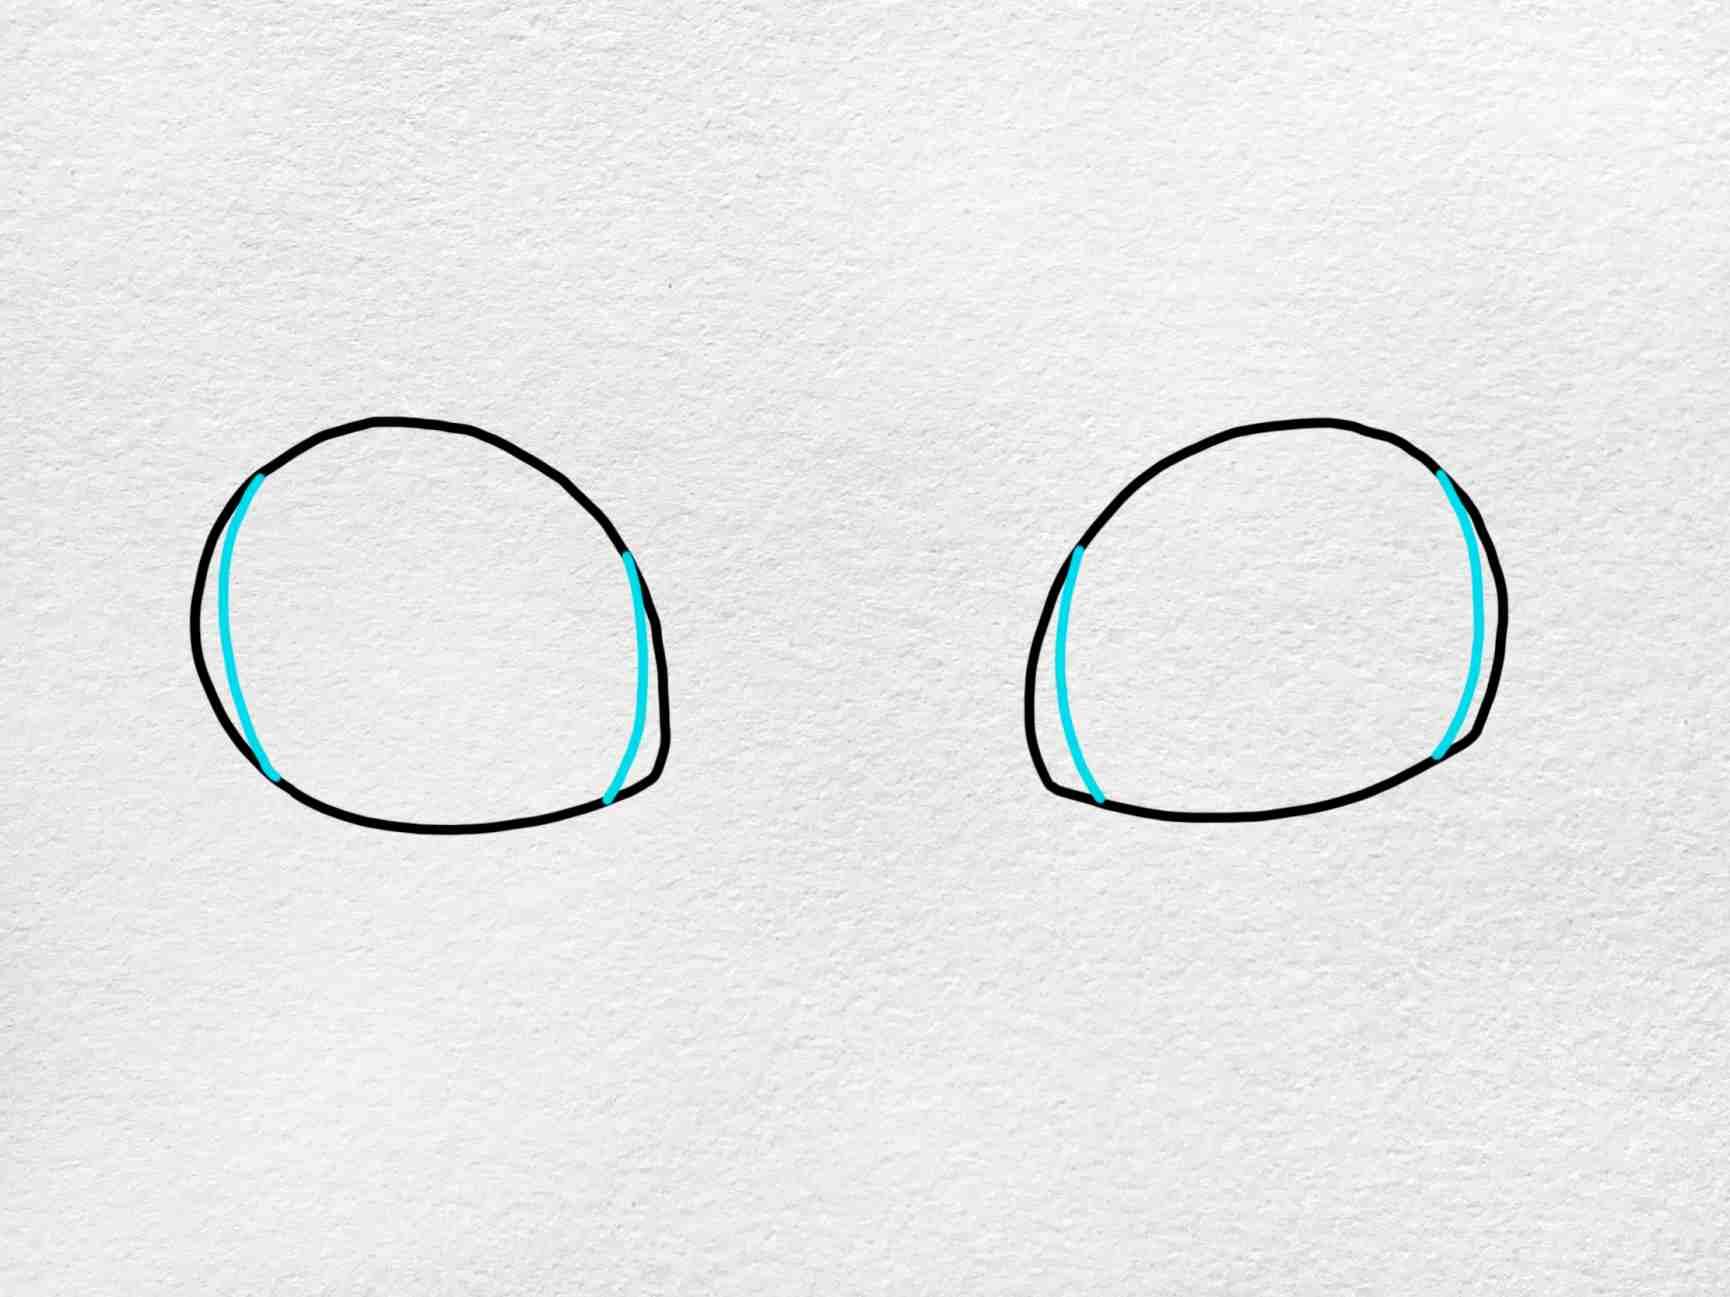 Cat Eyes Drawing: Step 3